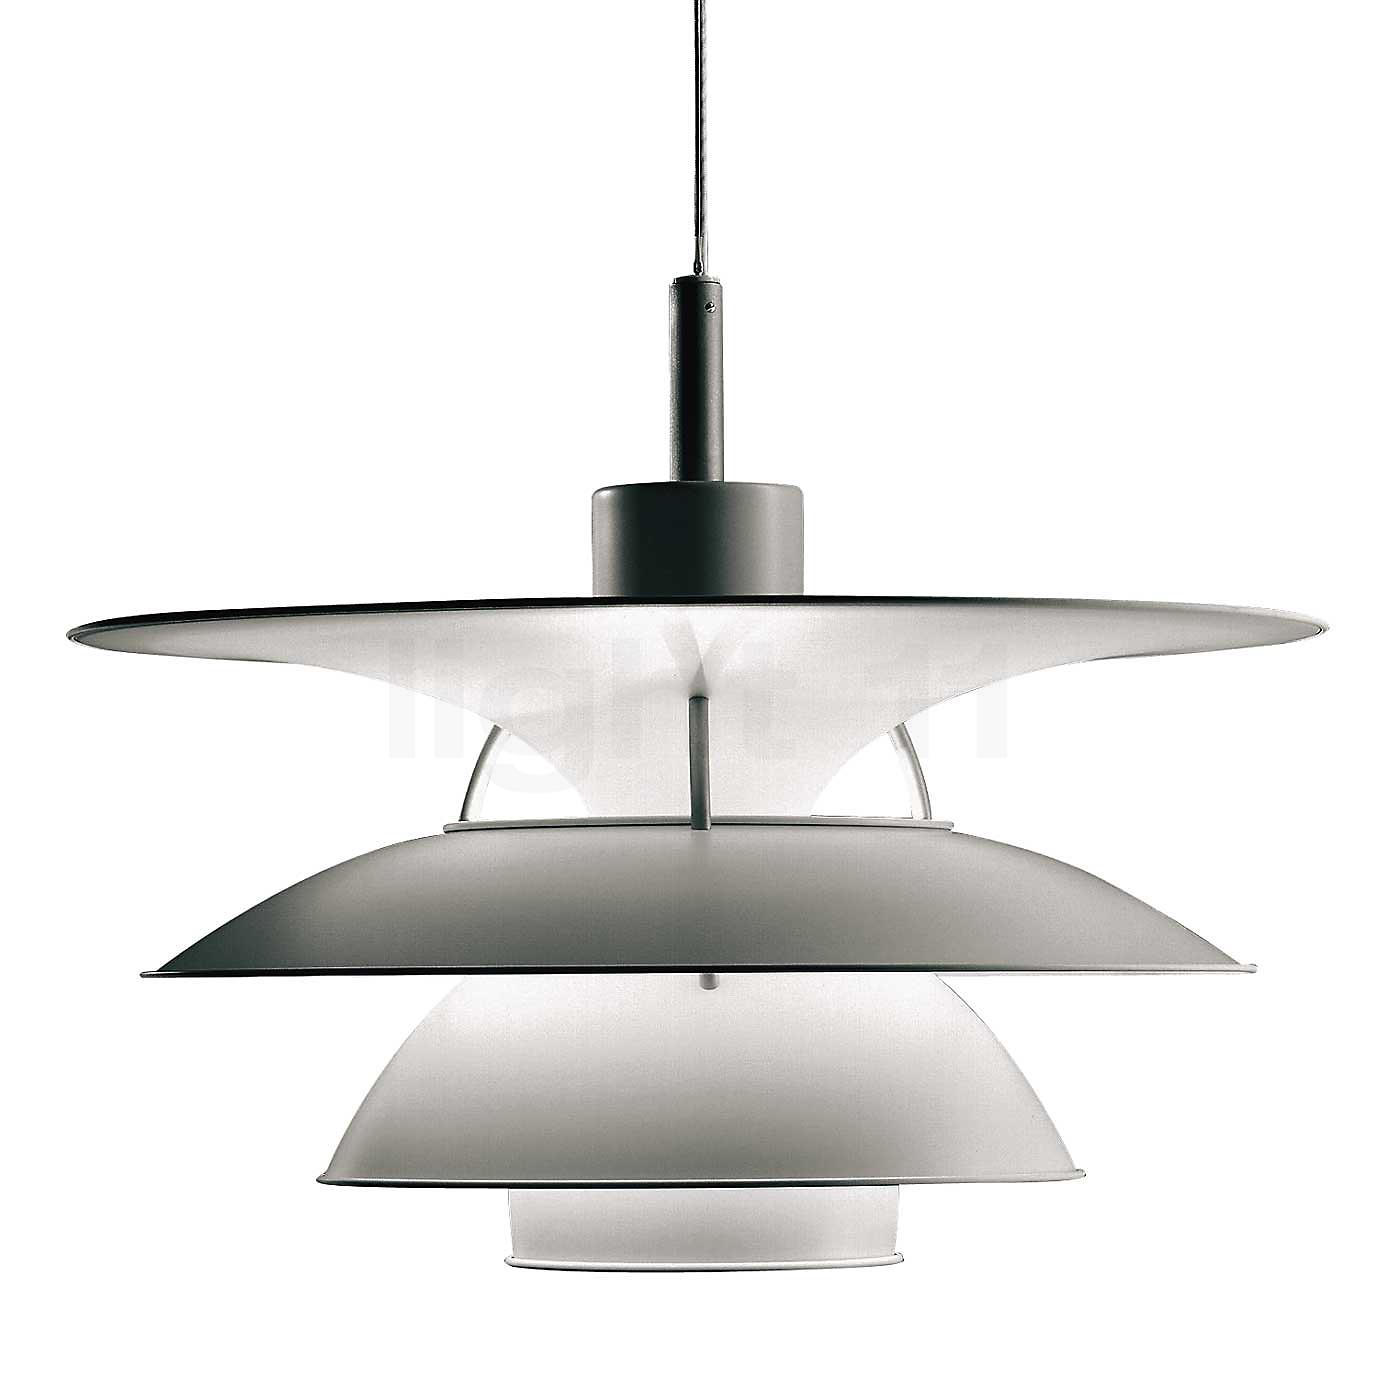 Louis poulsen luminaire suspendu ph 5 4 suspension for Lampe mit mehreren schirmen